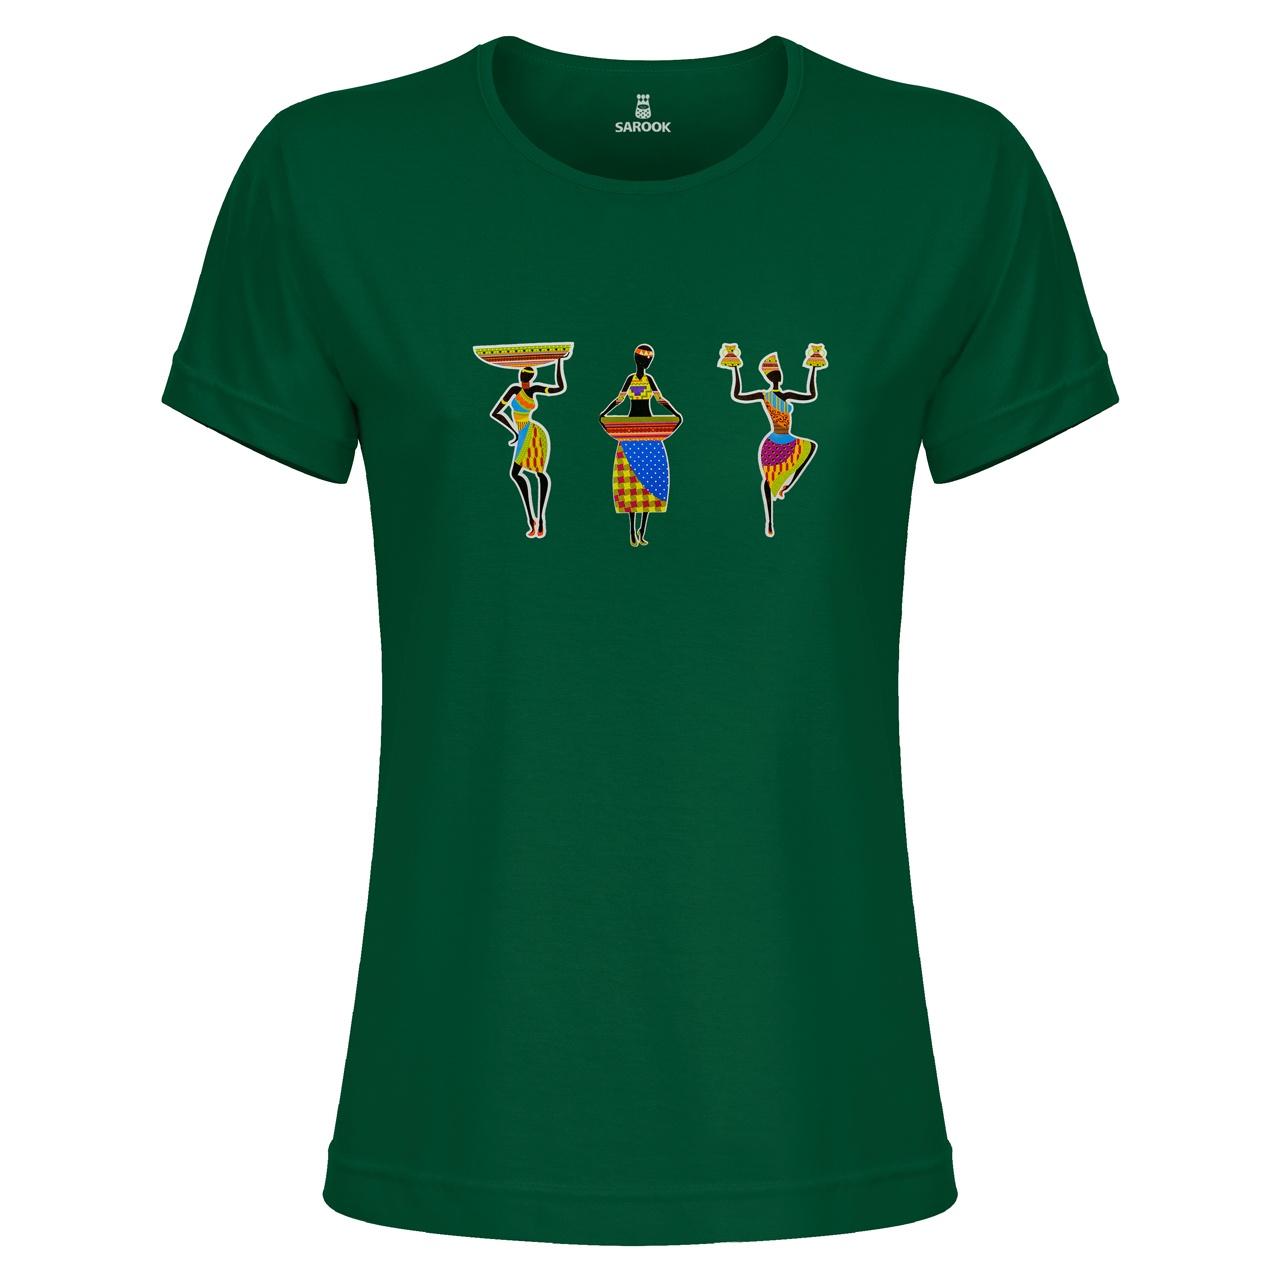 تی شرت زنانه ساروک مدل TZYUYRCH- 3AfricanO 08 رنگ یشمی